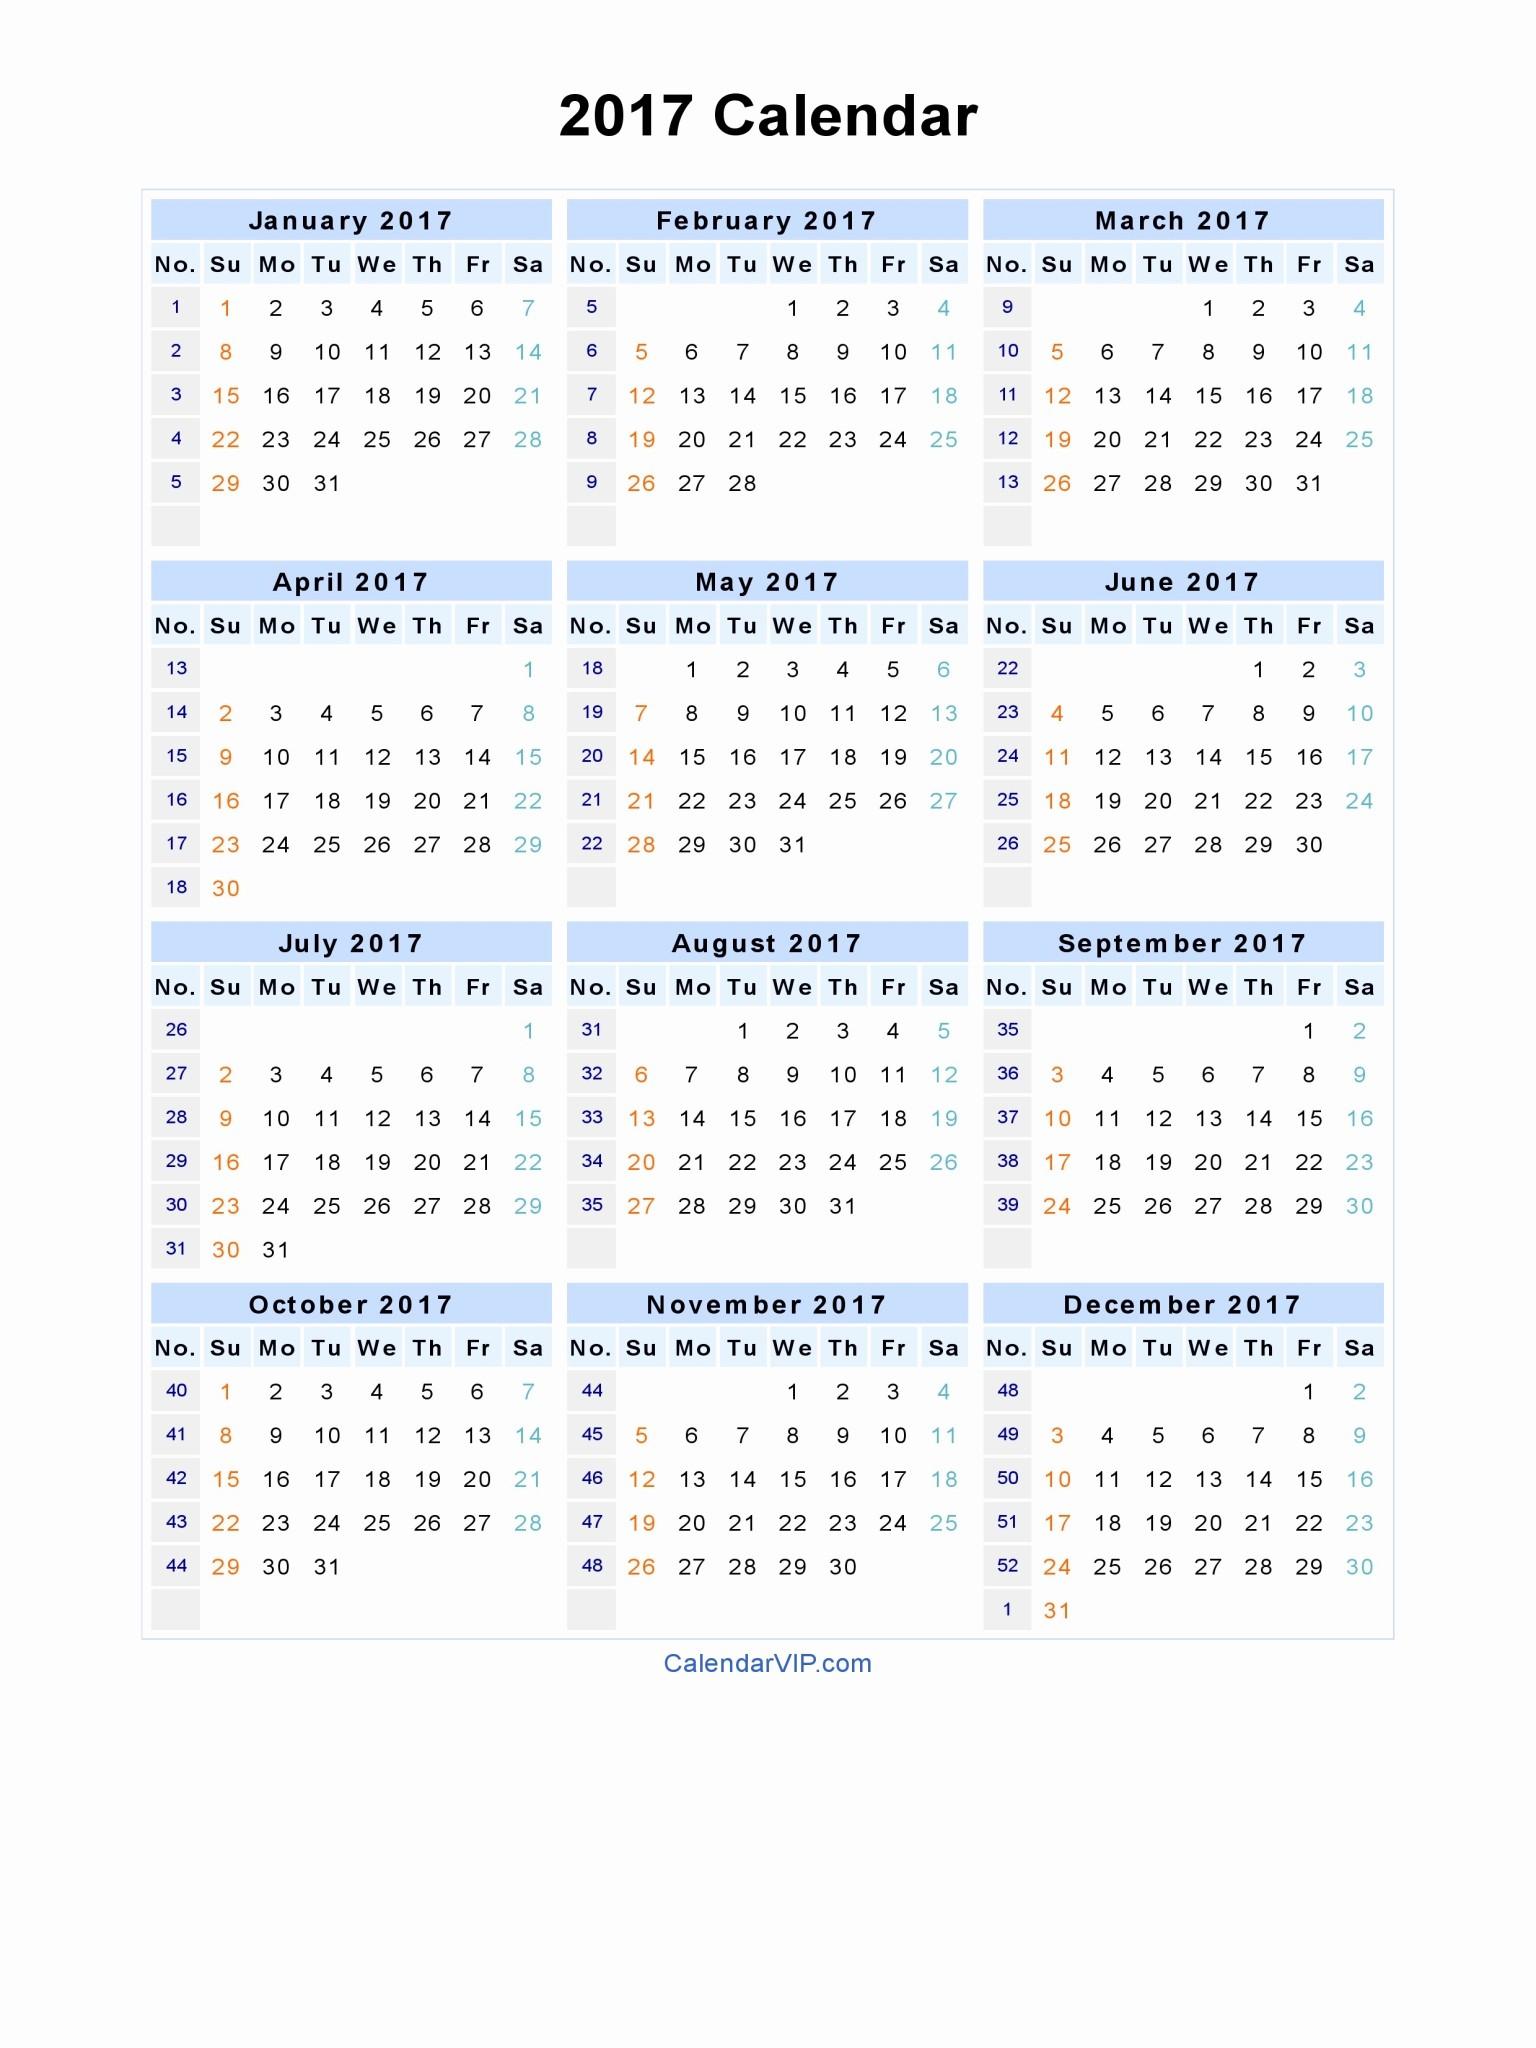 Free Printable Annual Calendar 2017 Luxury 2017 Printable Calendar Word